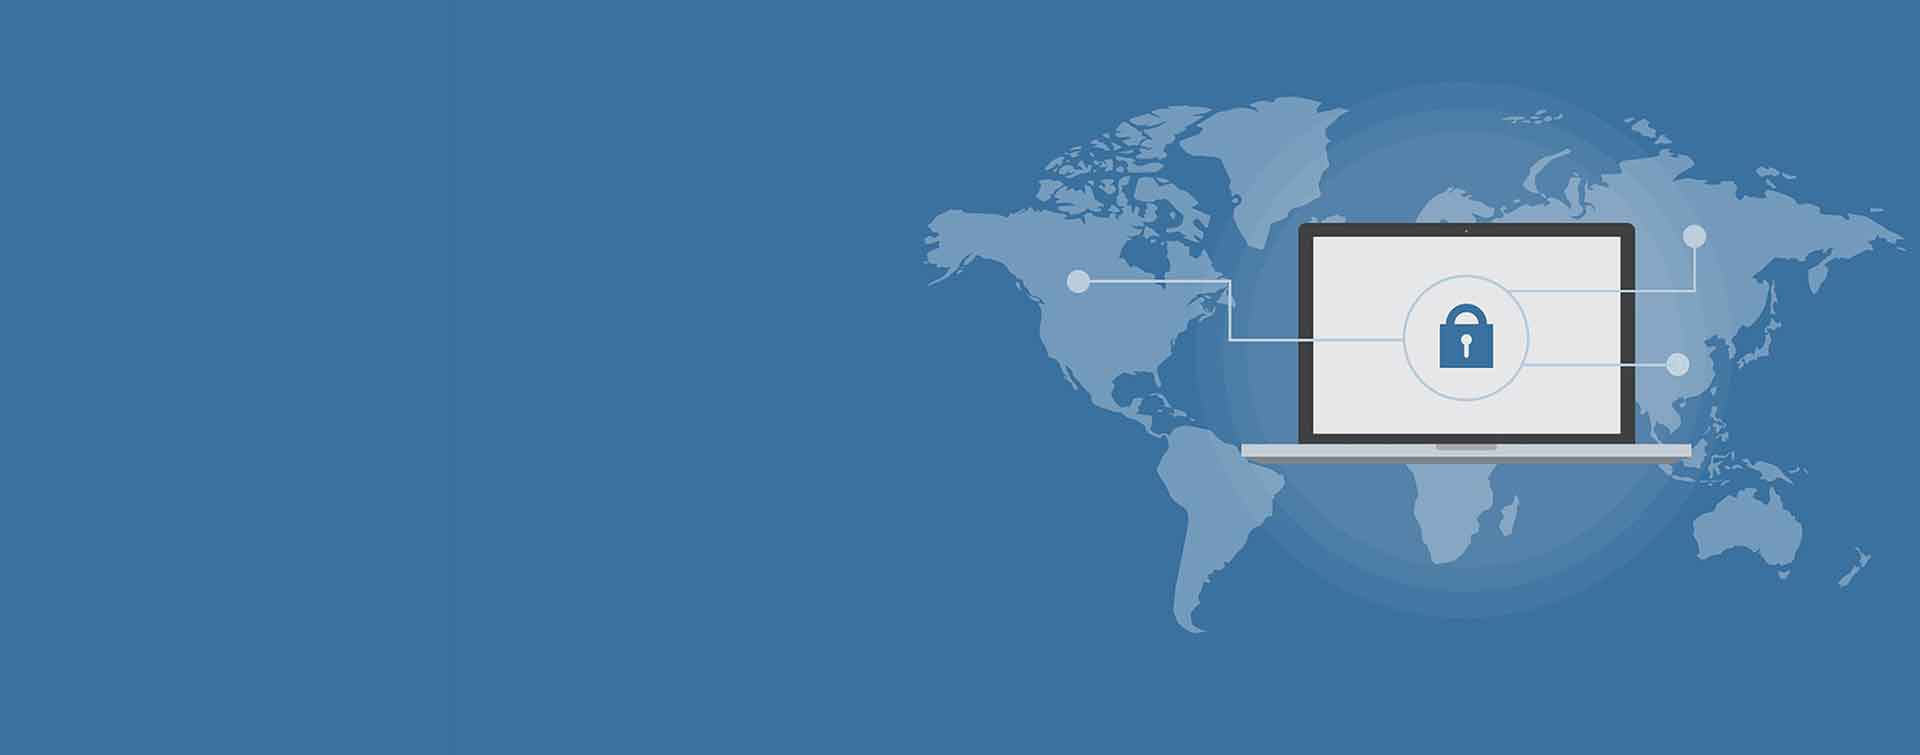 evoluzione-ufficio-sicurezza-informatica-internet-security-cyber-security